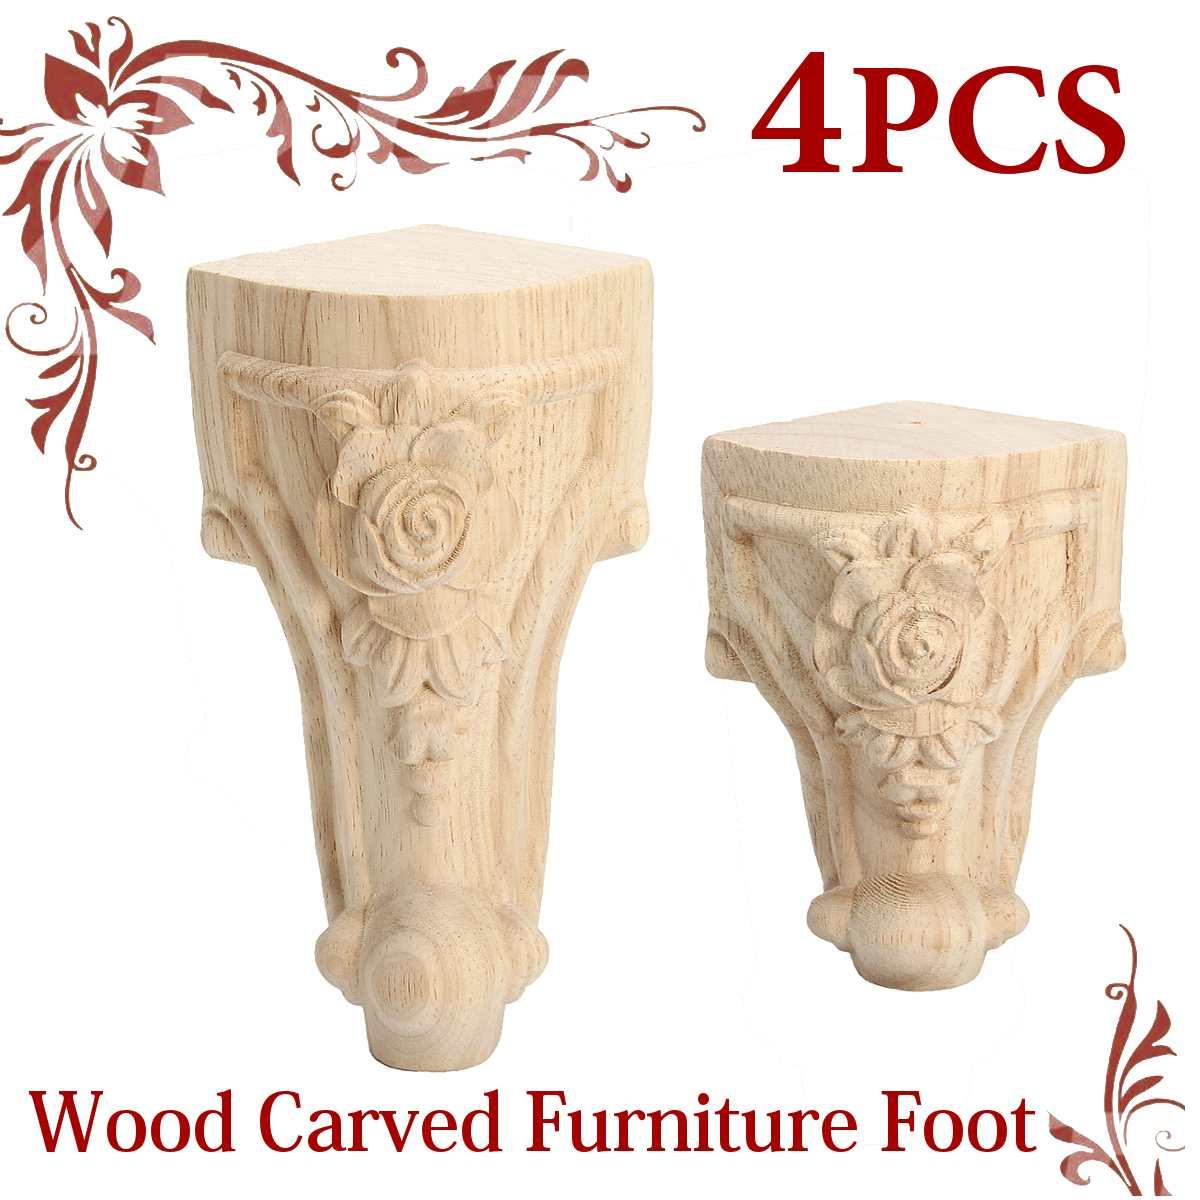 4Pcs/set 15x6cm/10x6cm European Furniture Foot Carved Wood TV Cabinet Seat Foot Bathroom Cabinet Legs